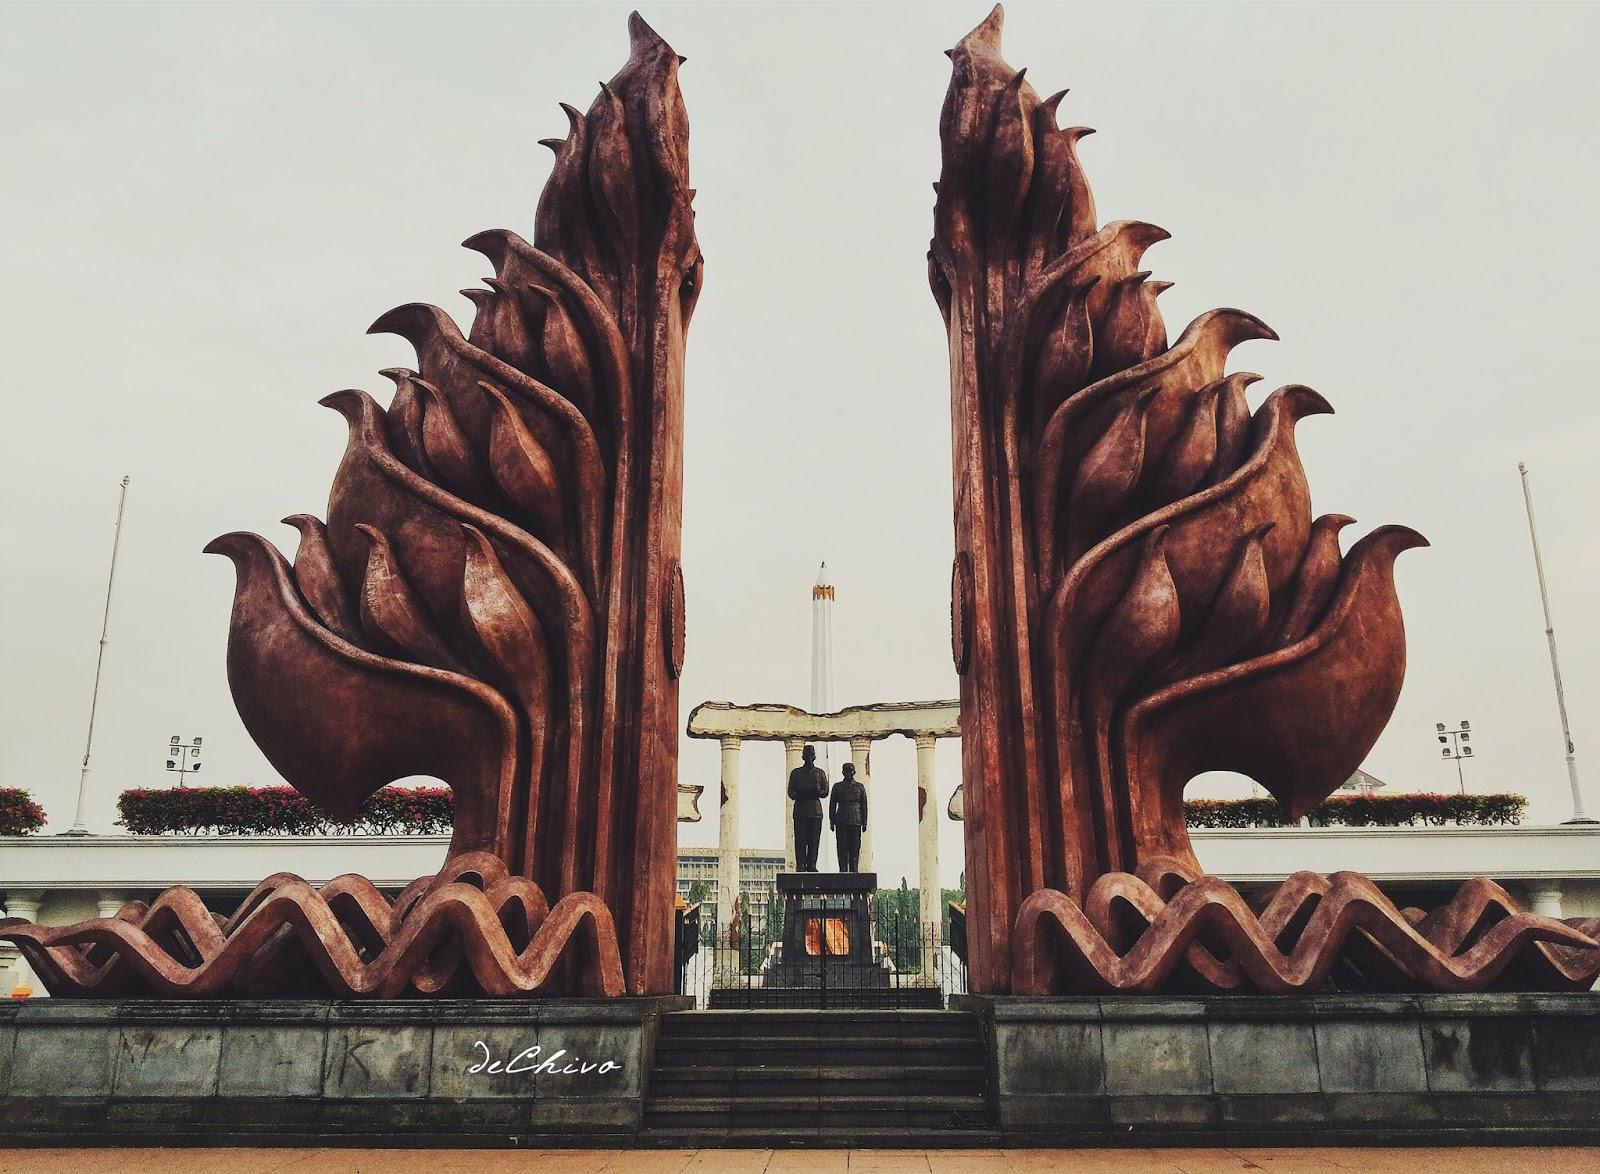 Bagian depan Tugu Pahlawan Surabaya_Patung Soekarno-Hatta